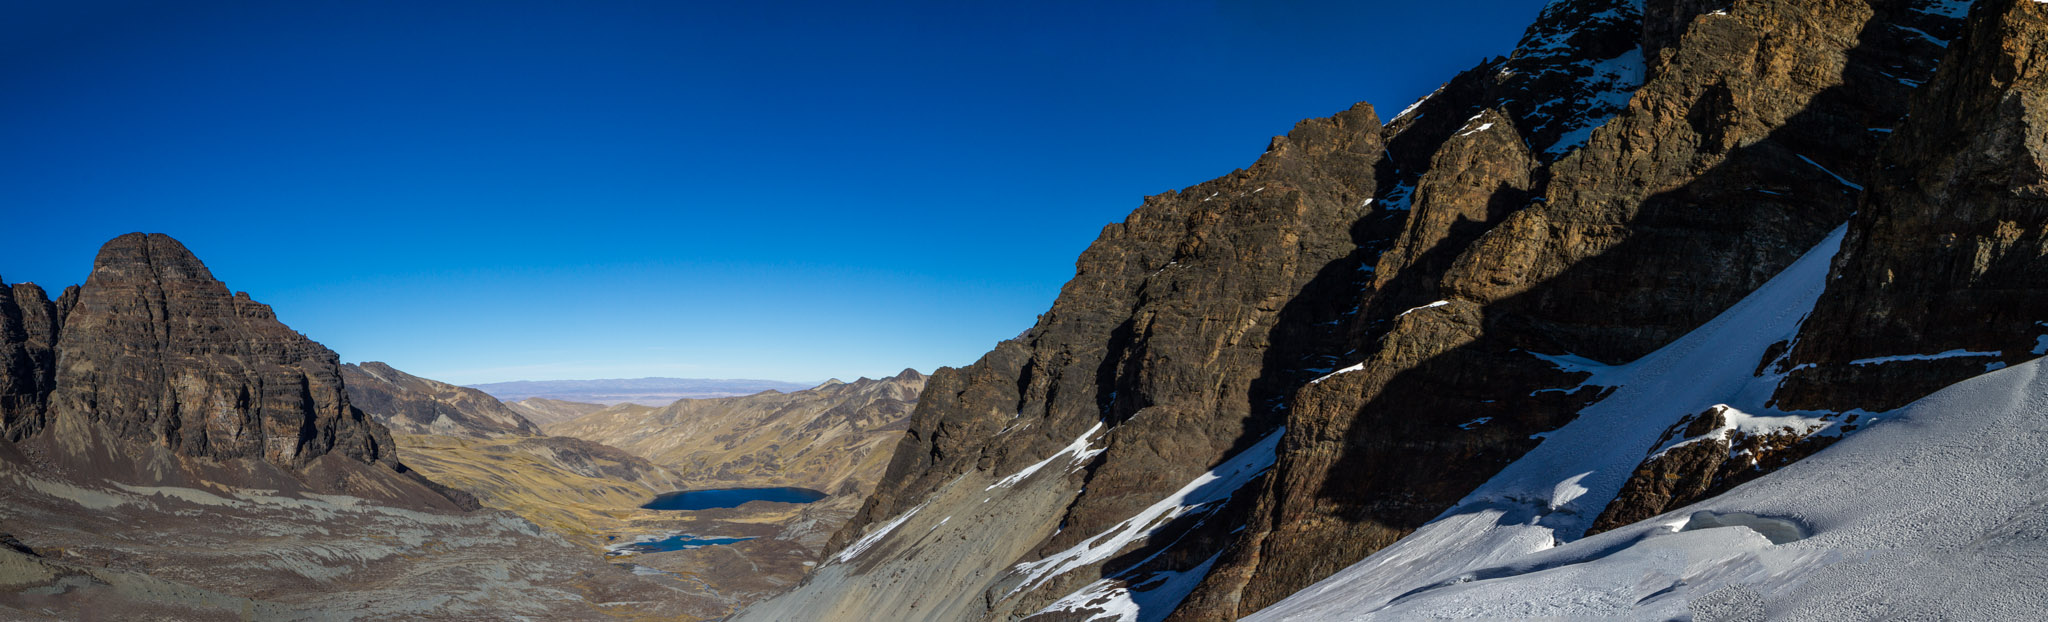 Ali-Barqawi-Studios-Explore-Series-Travel-Adventure-Documentary-C4CGAZA-Bolivia-Mount-Tarija-2015-183.jpg